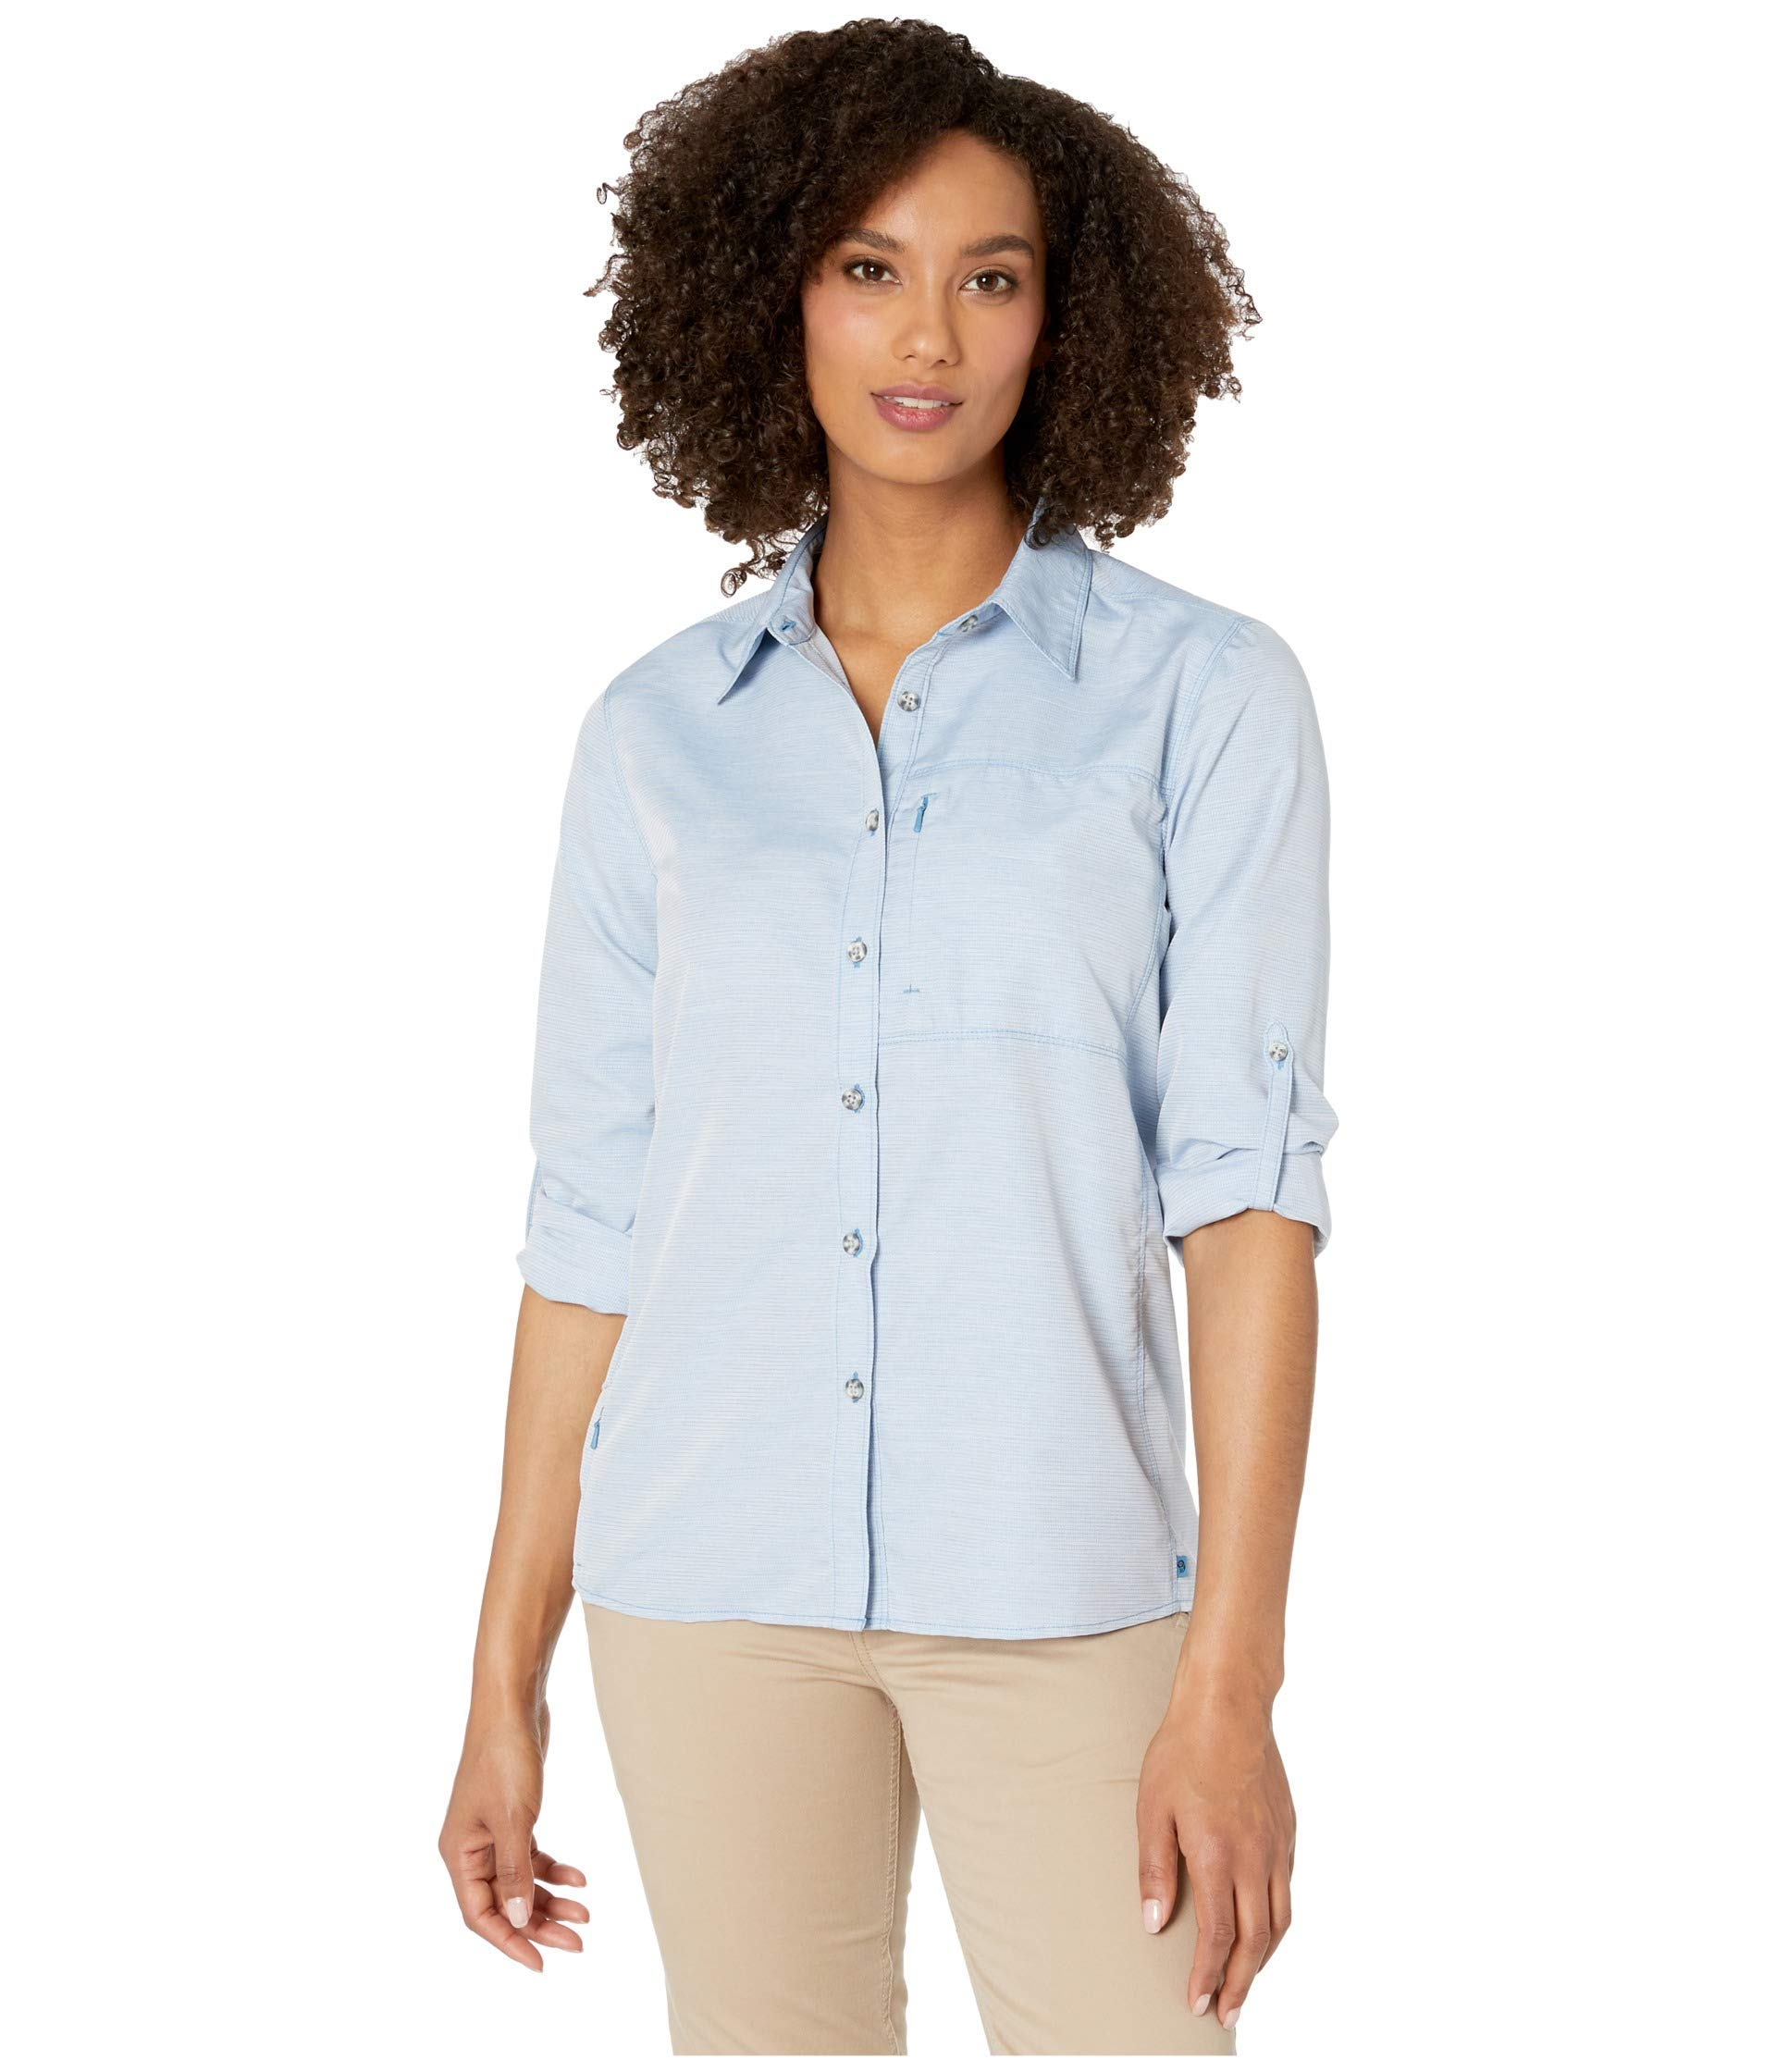 Mountain Hardwear Canyon Women's Long Sleeve Shirt for Hiking and Everyday